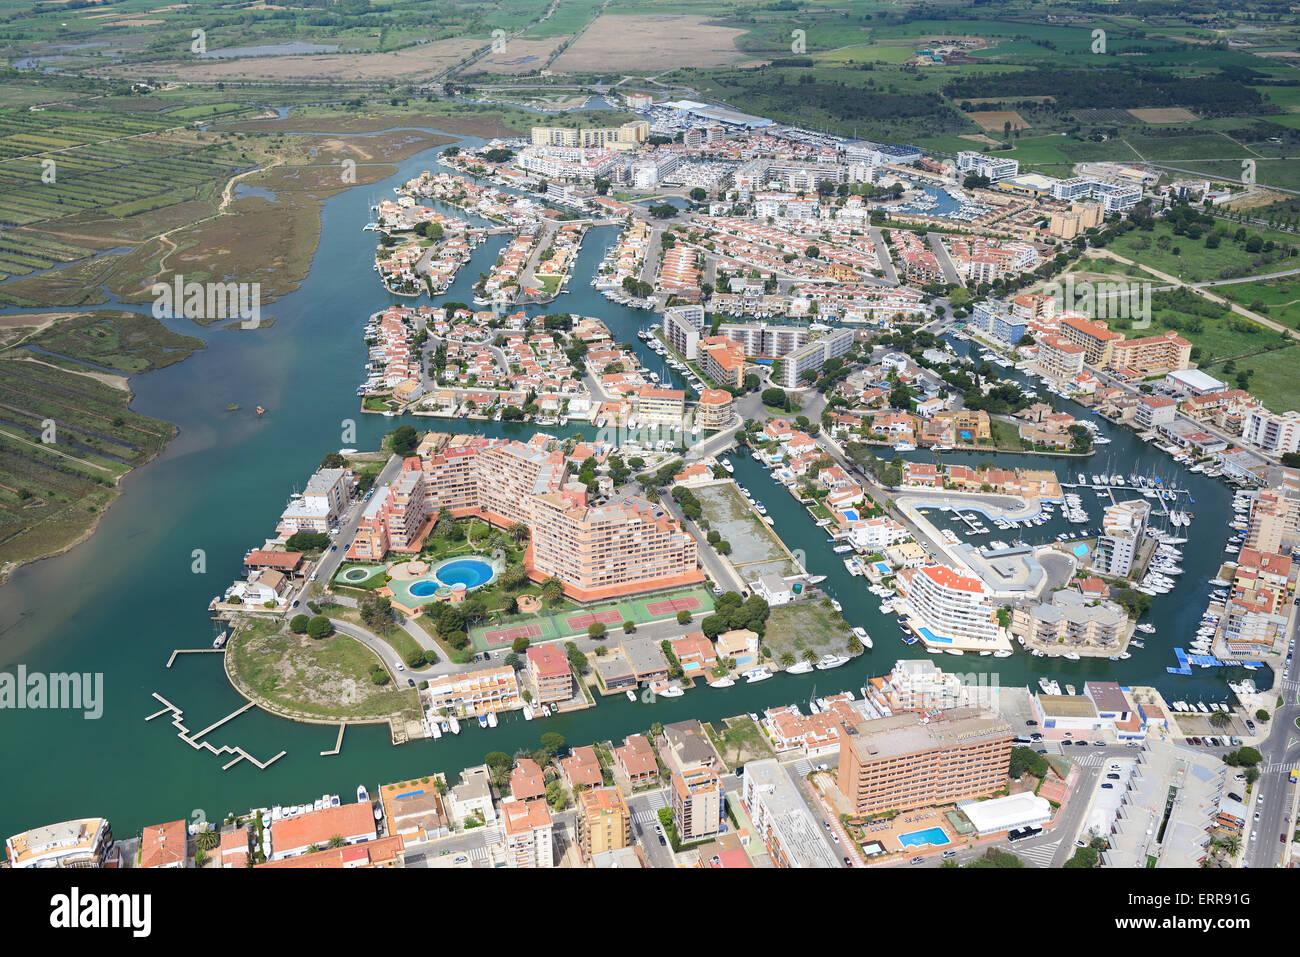 Marina luftbild roses costa brava katalonien spanien - Office de tourisme rosas costa brava ...